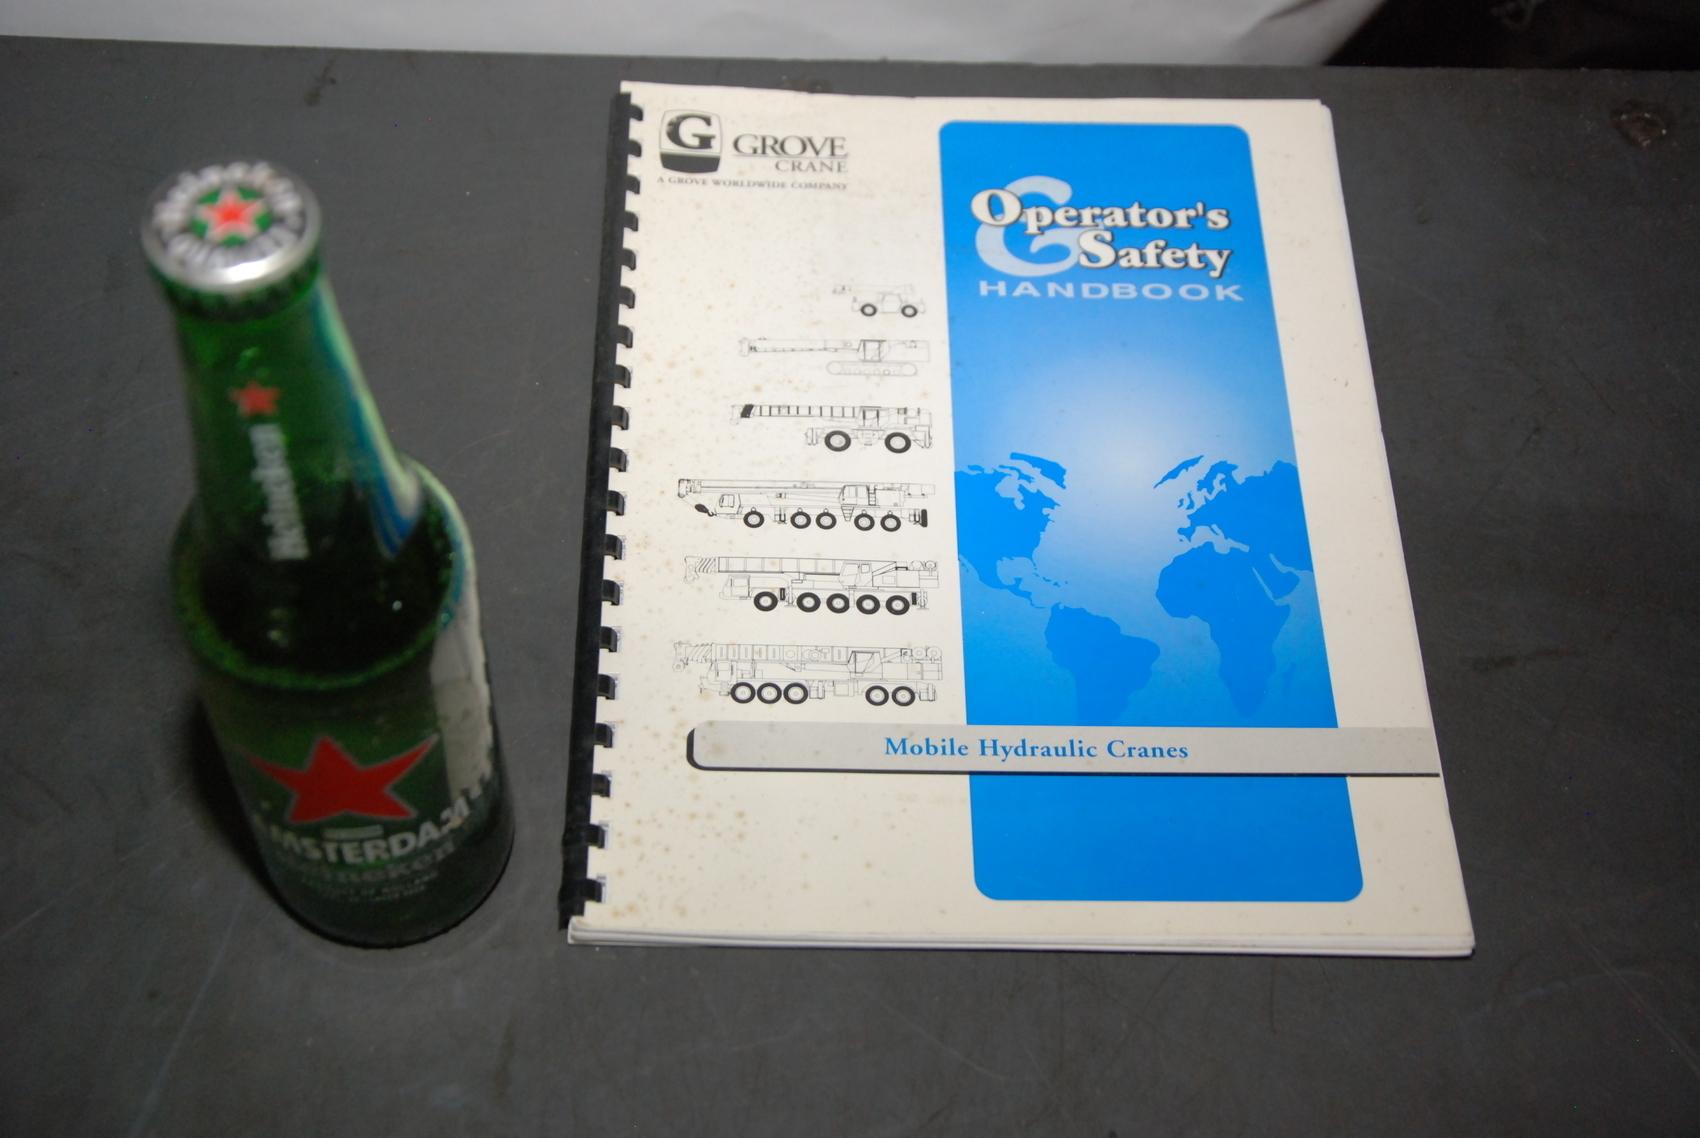 GROVE RT700E Series Crane operators and safety handbook manual nopl